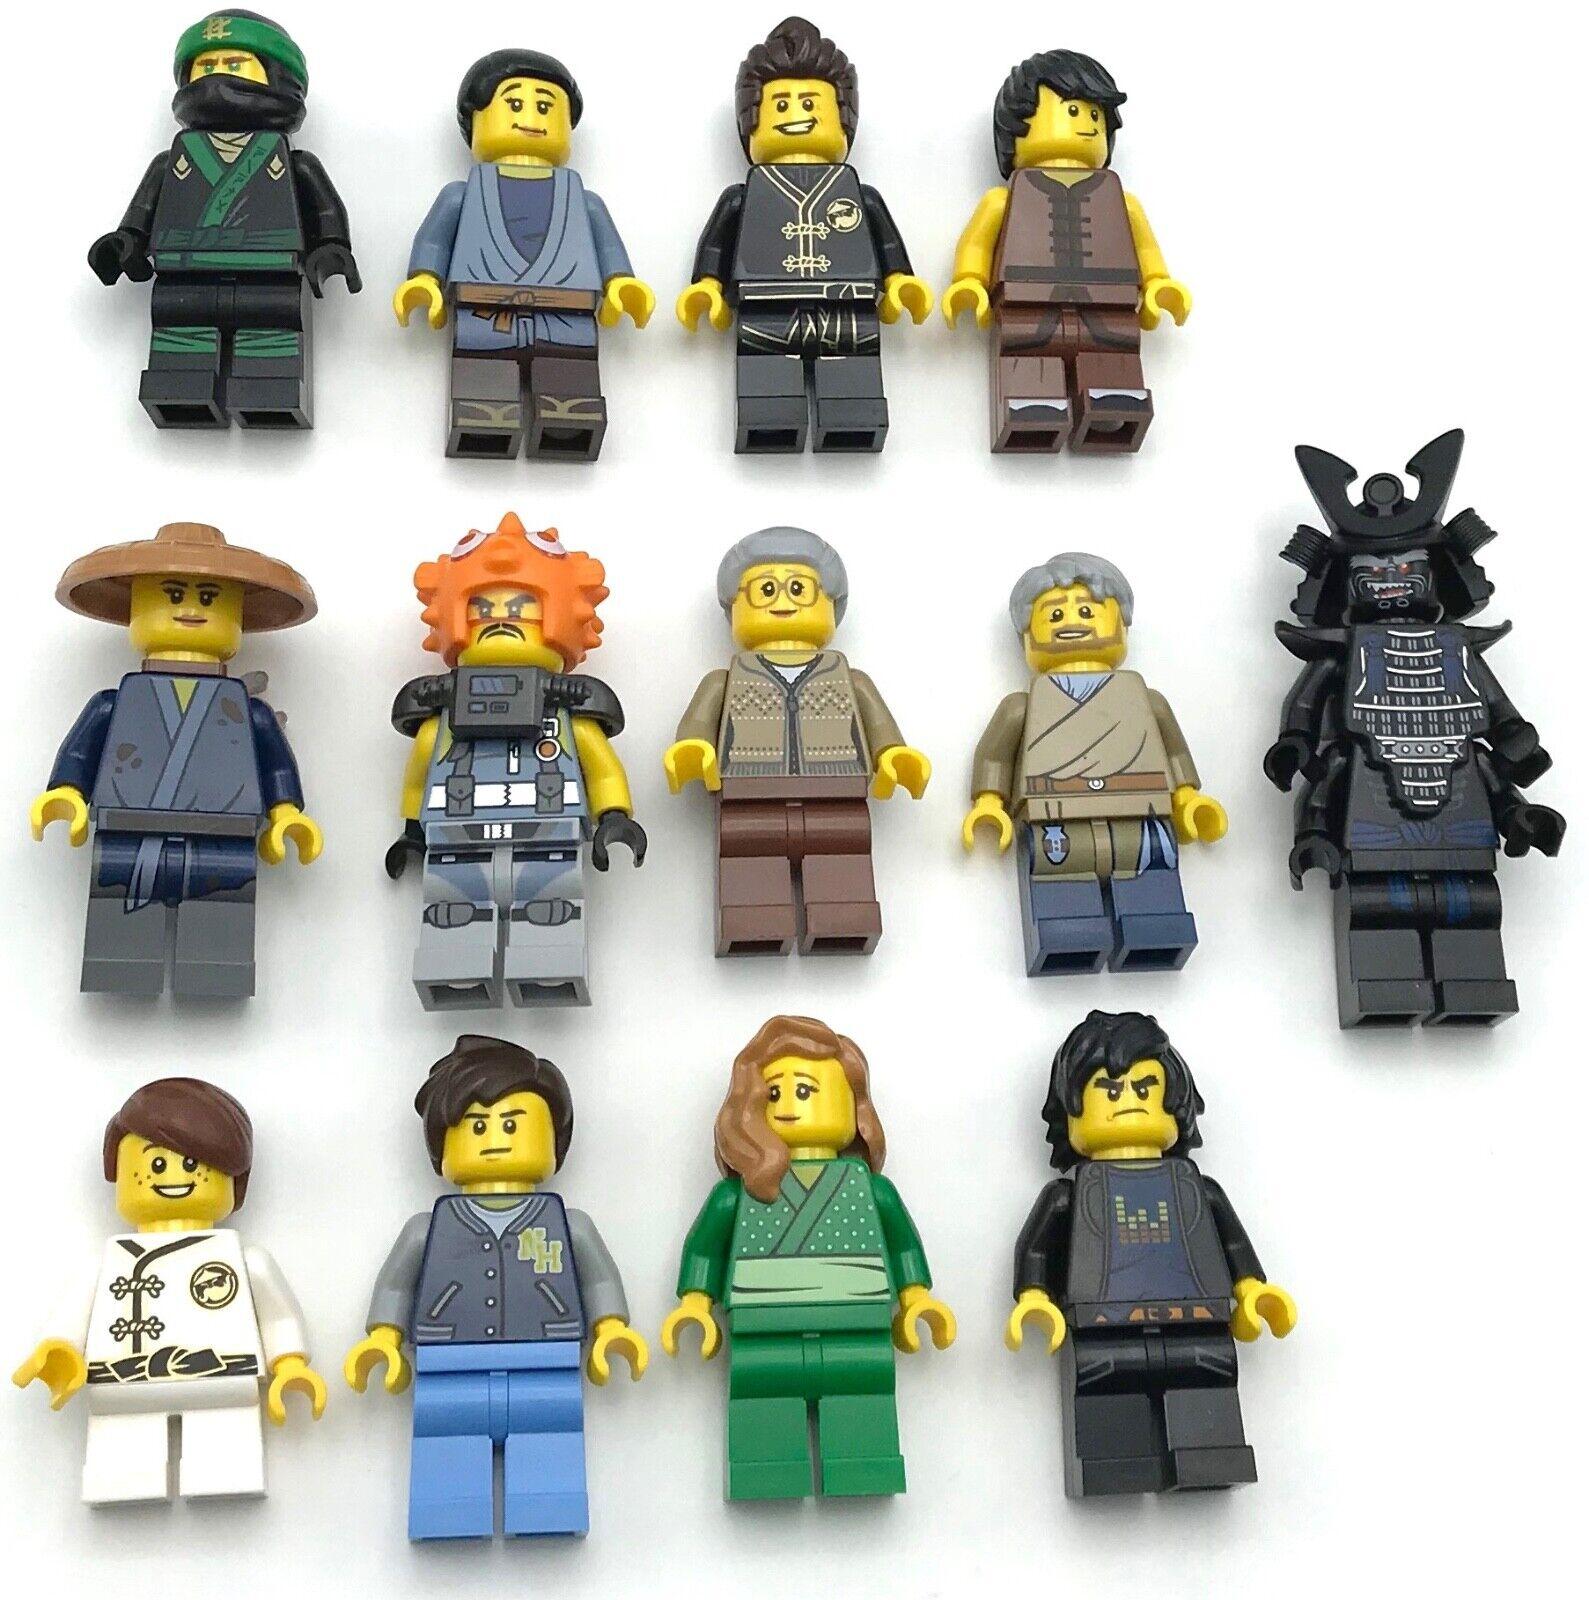 Lego Nouveau Ninja Mini Figurines de Film Set 70657 Ninjago City Quais You Pic